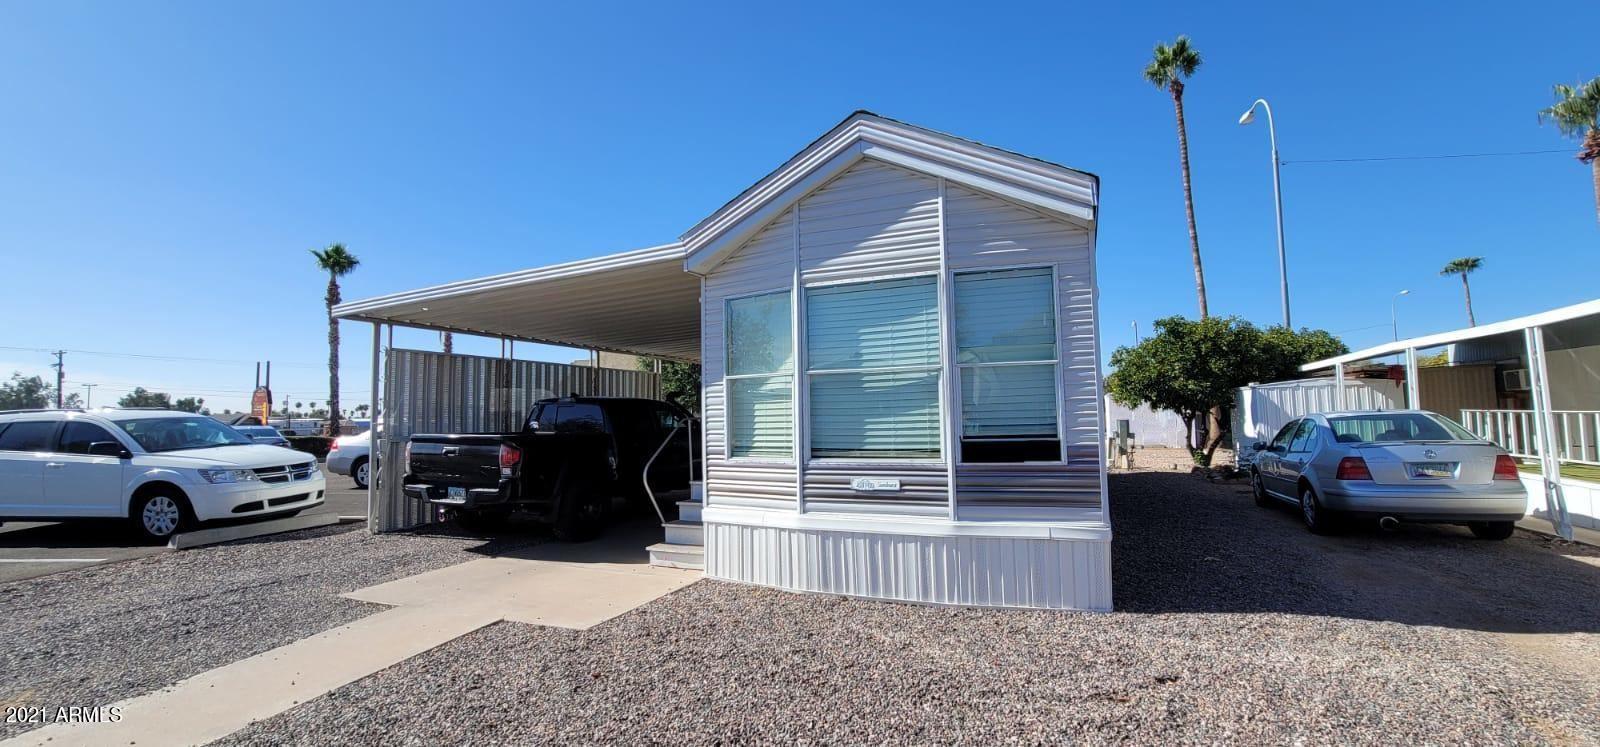 9310 E MAIN Street #38, Mesa, AZ 85207 - MLS#: 6258005